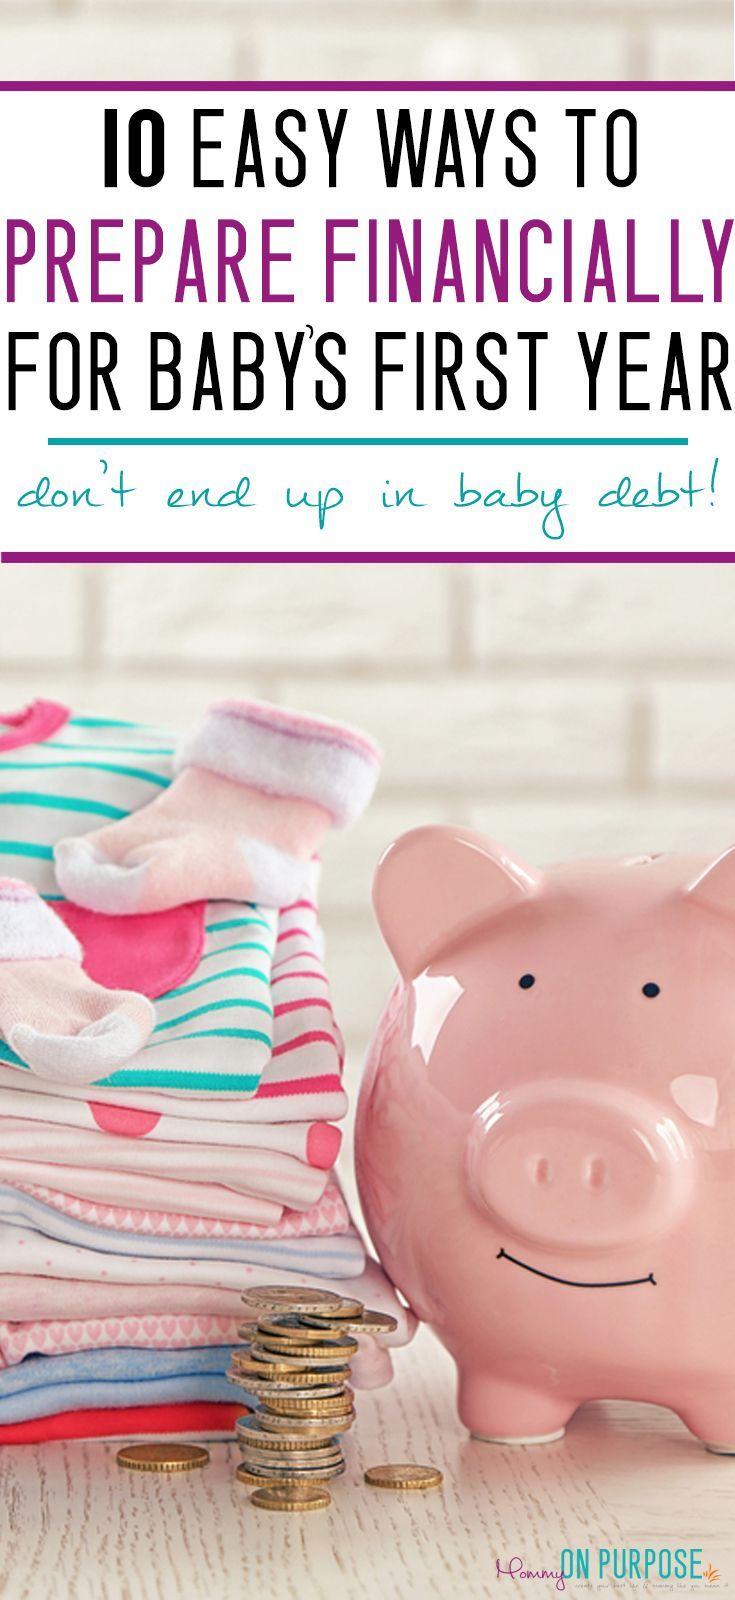 8772 best Babies & Beyond images on Pinterest